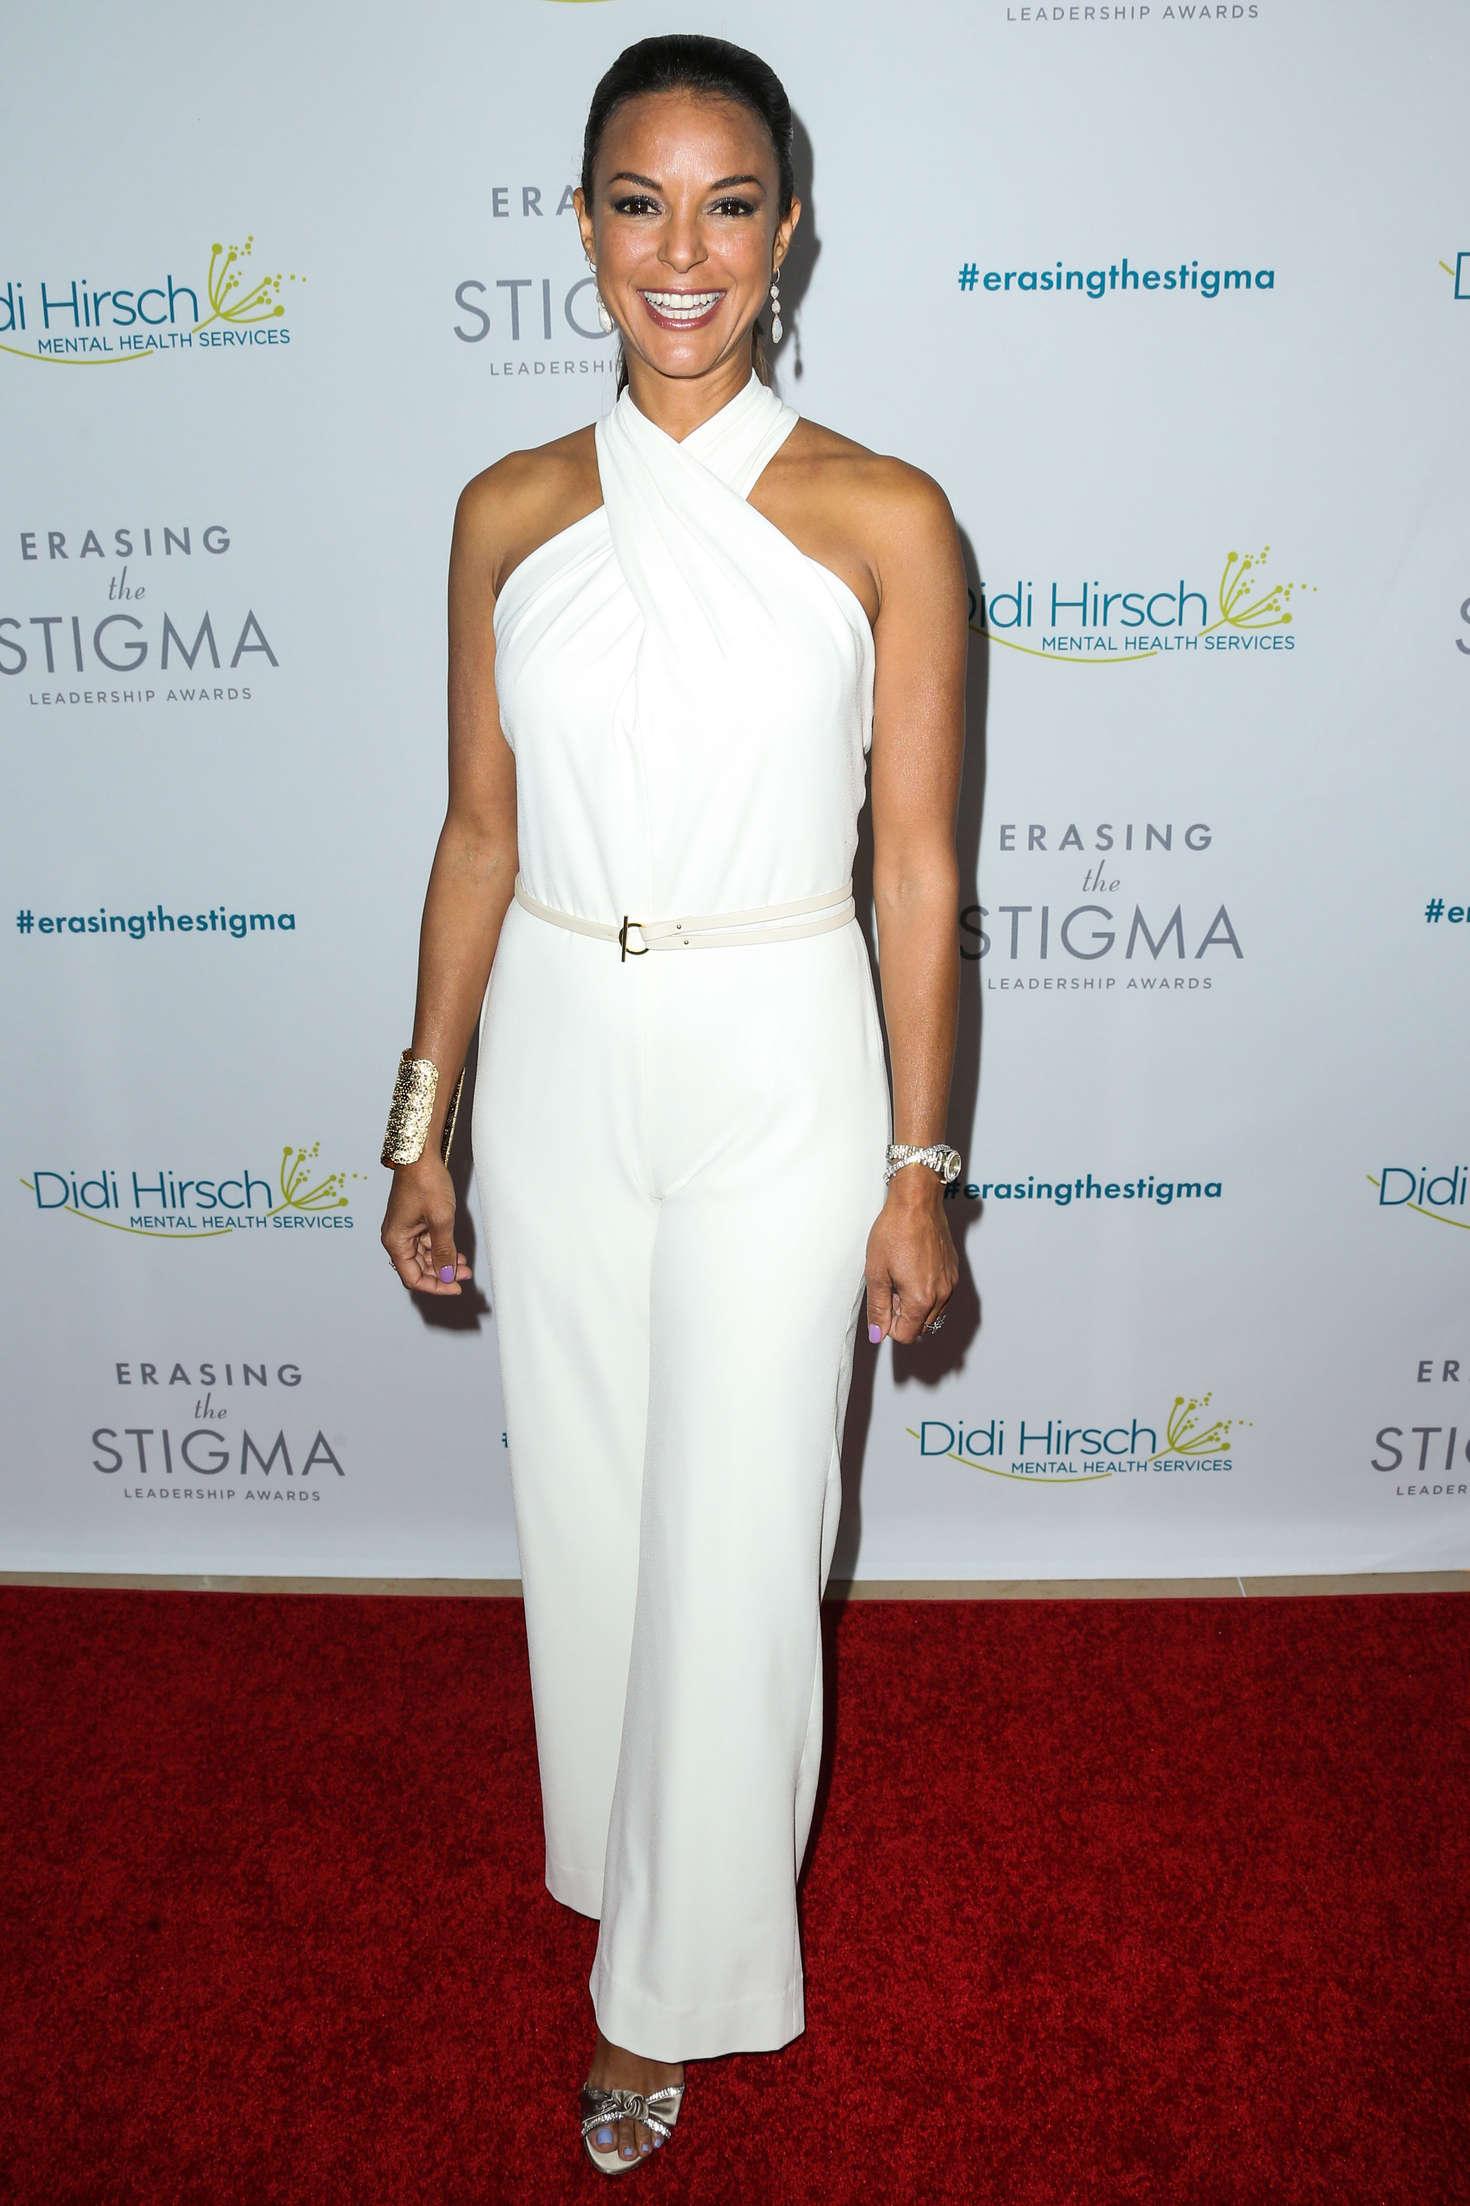 Eva LaRue Stigma Leadership Awards in Beverly Hills